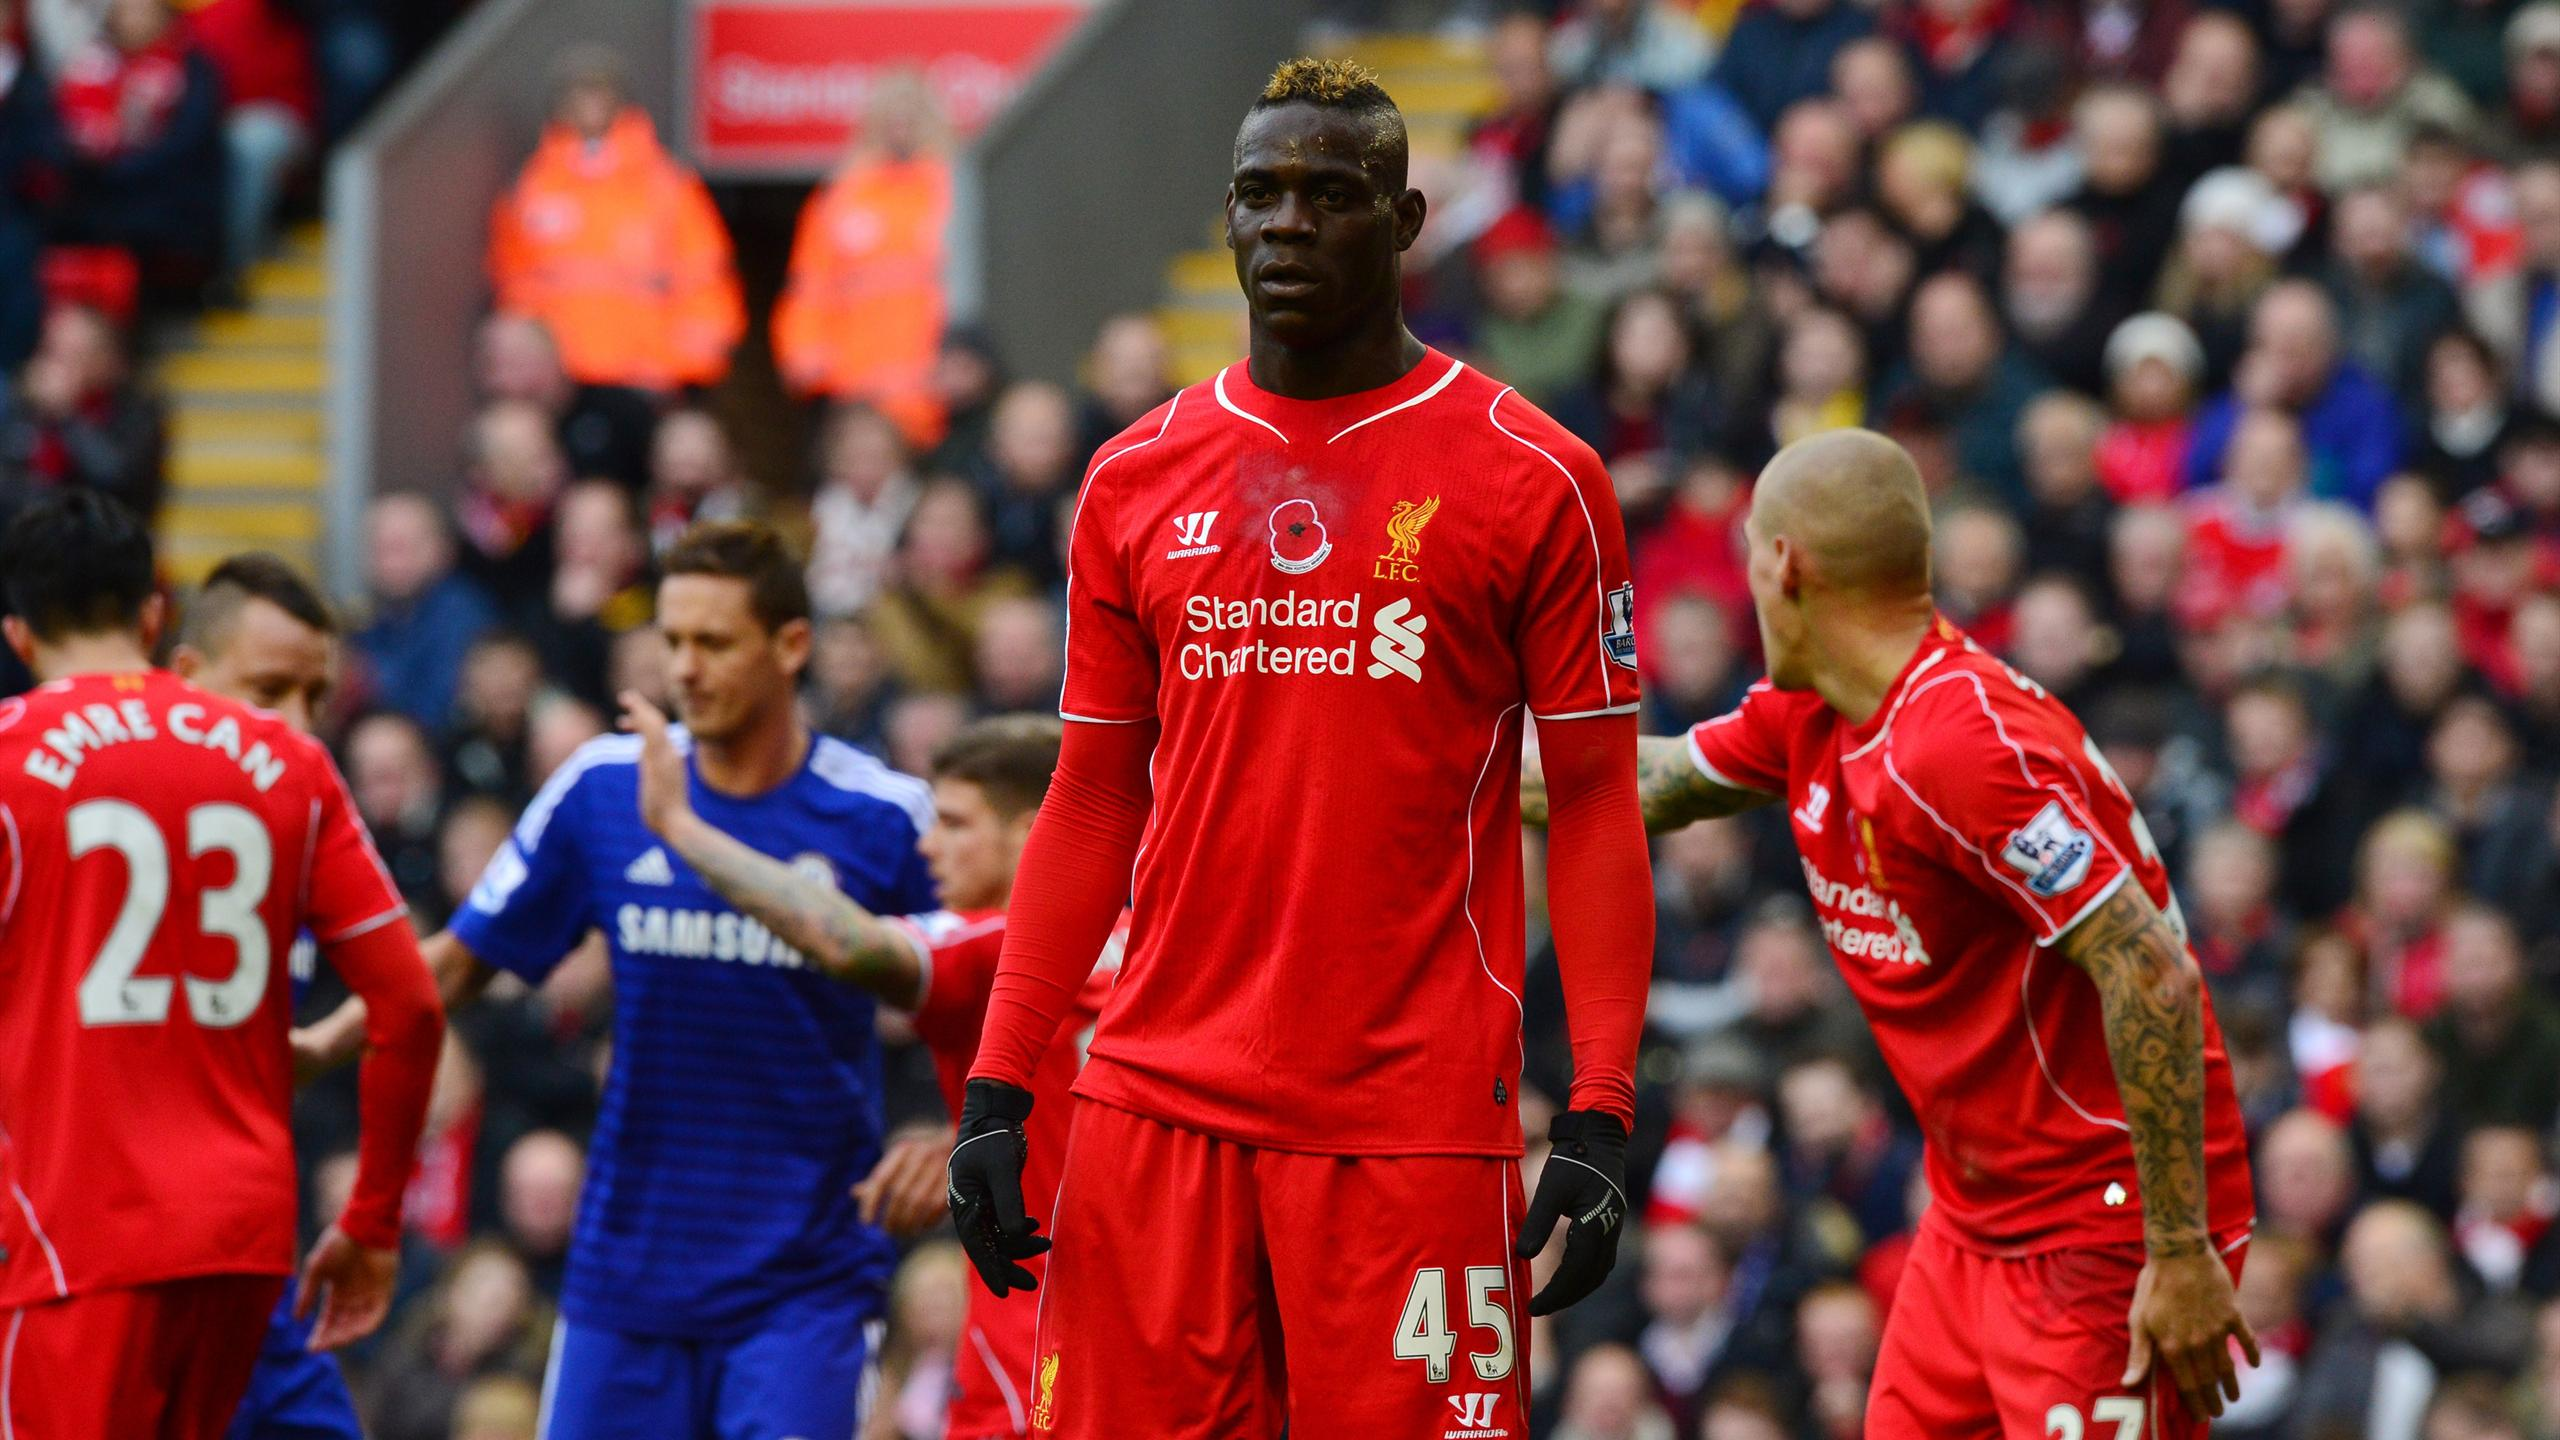 Mario Balotelli (Liverpool) contre Chelsea en Premier League le 8 novembre 2014